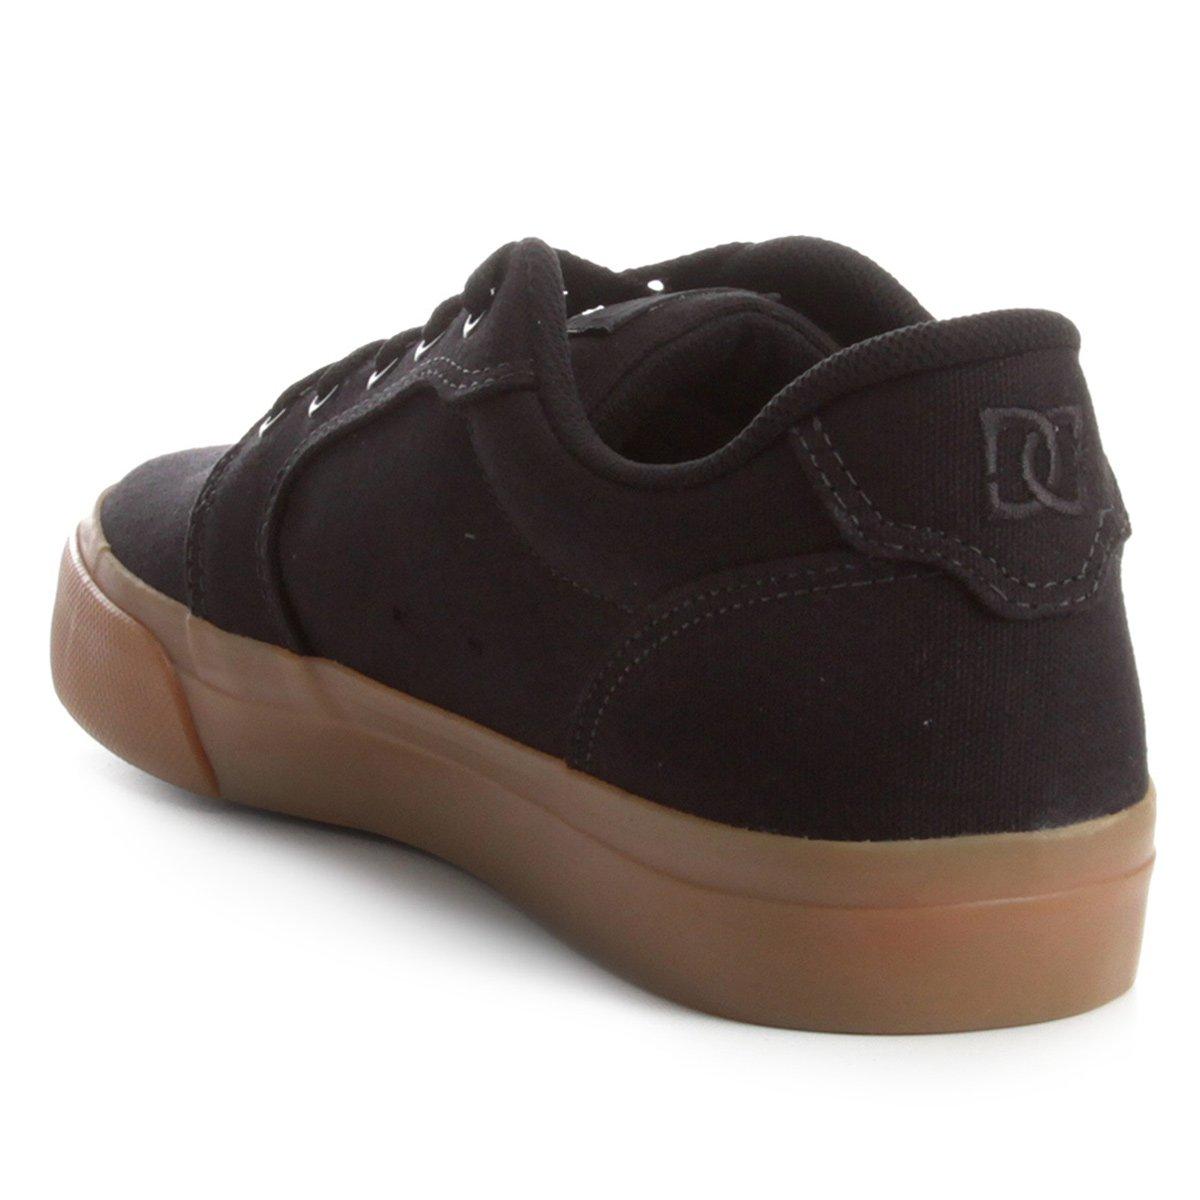 7a79c11d71 Tênis Dc Shoes Anvil Tx La Masculino - Preto - Compre Agora